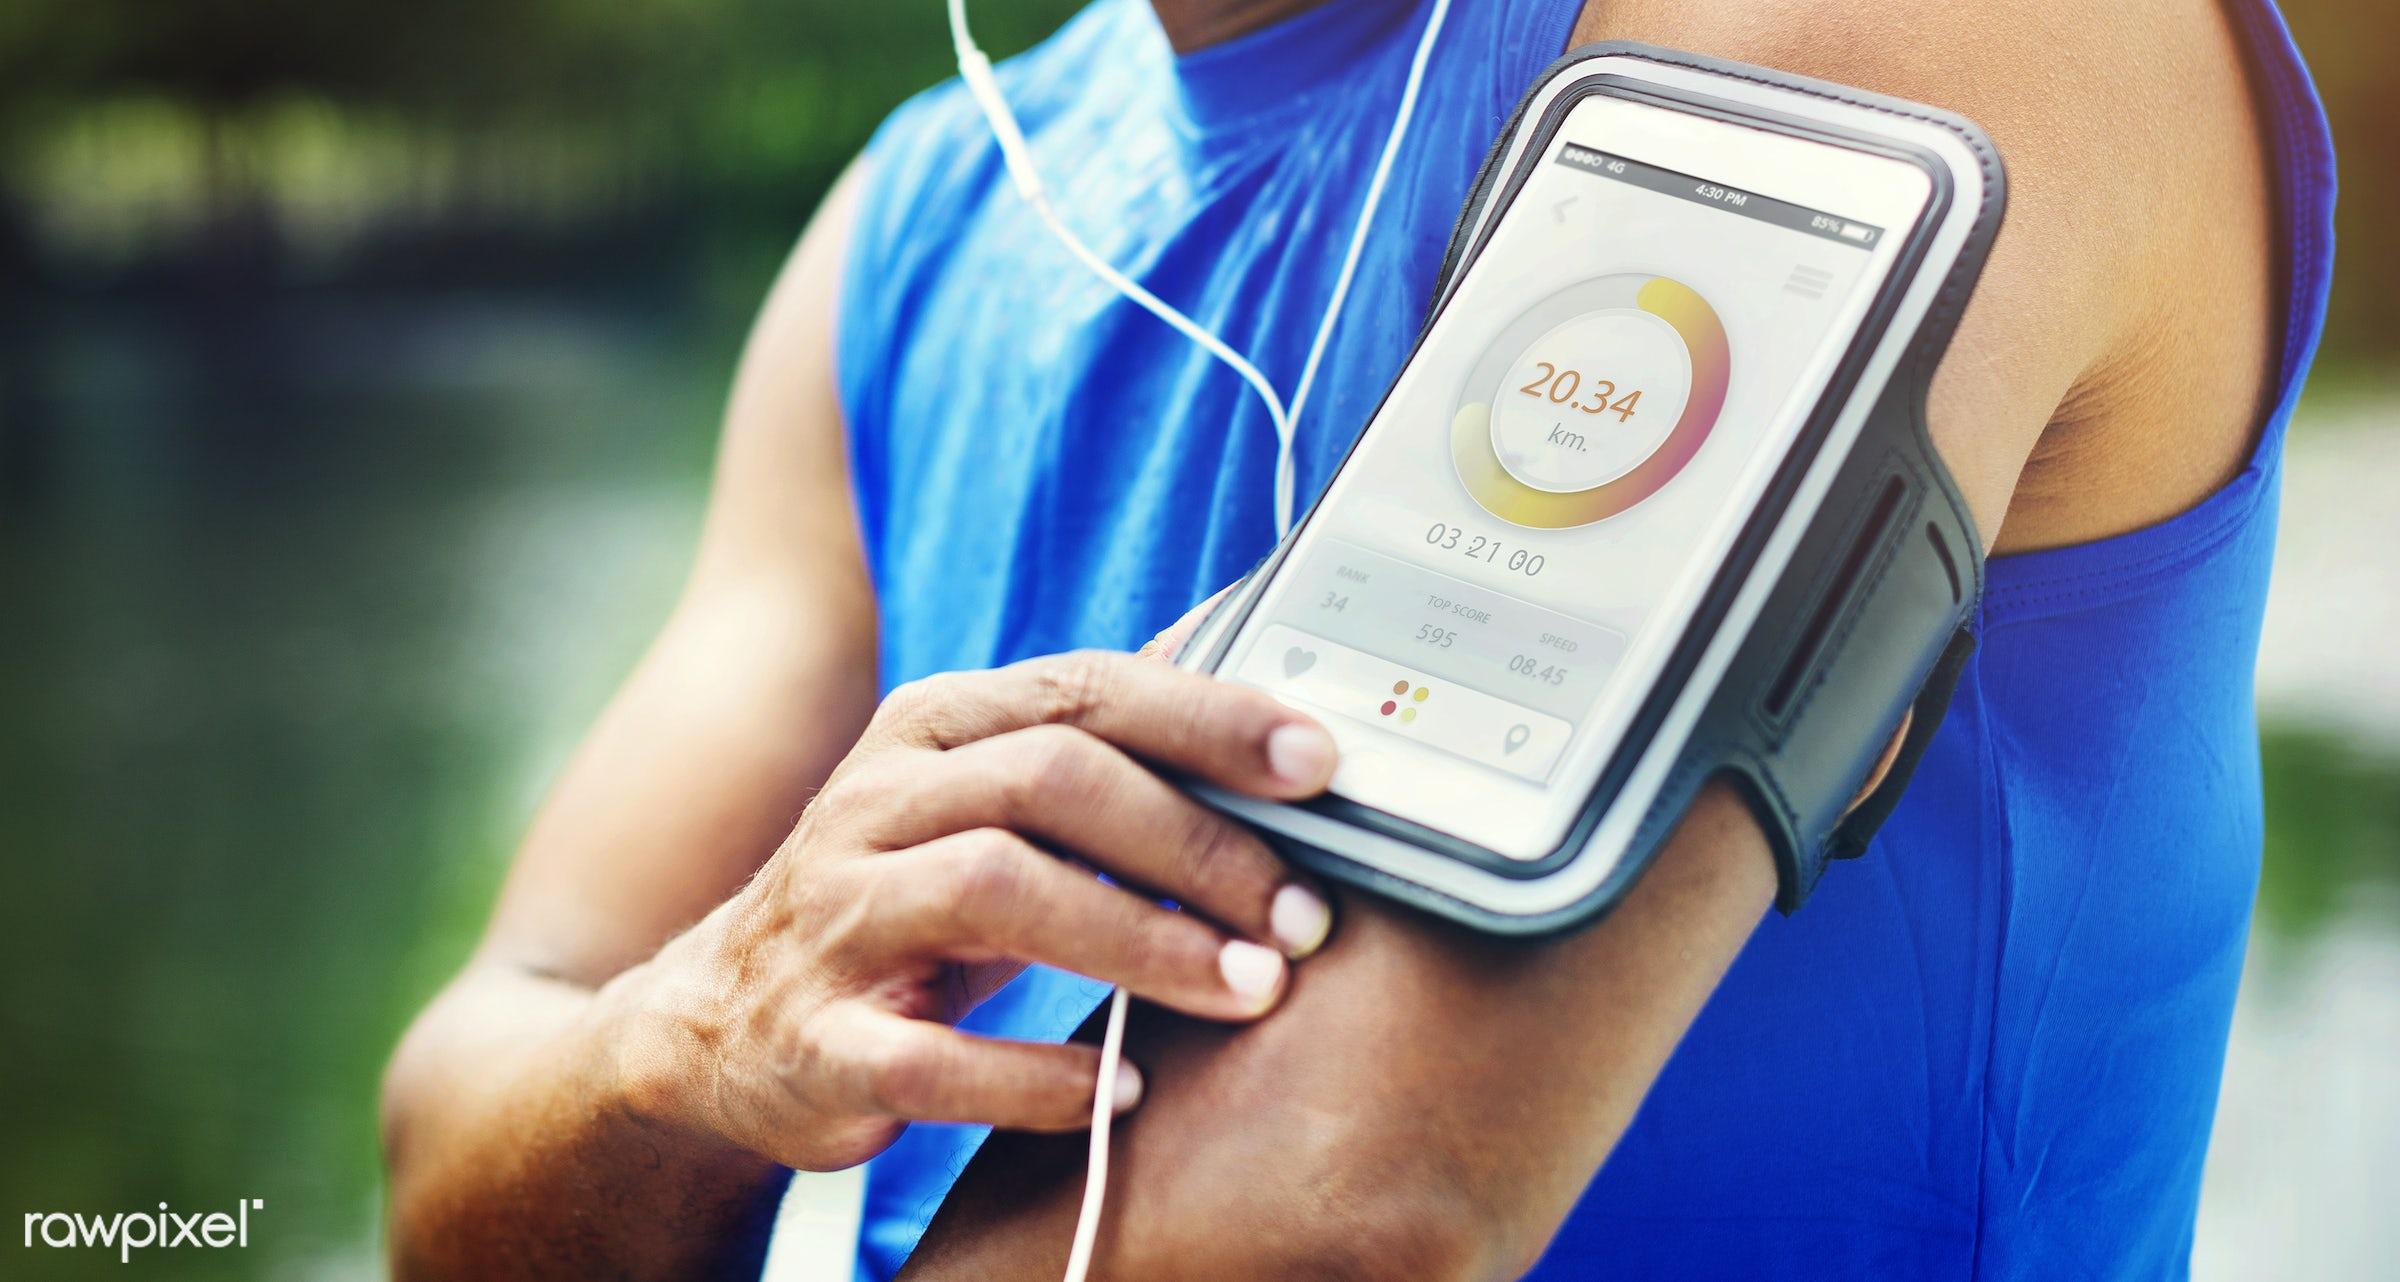 app, marathon, run, running, active, activity, arm, armband, arms, athlete, athletic, cardio, device, distance, earphones,...